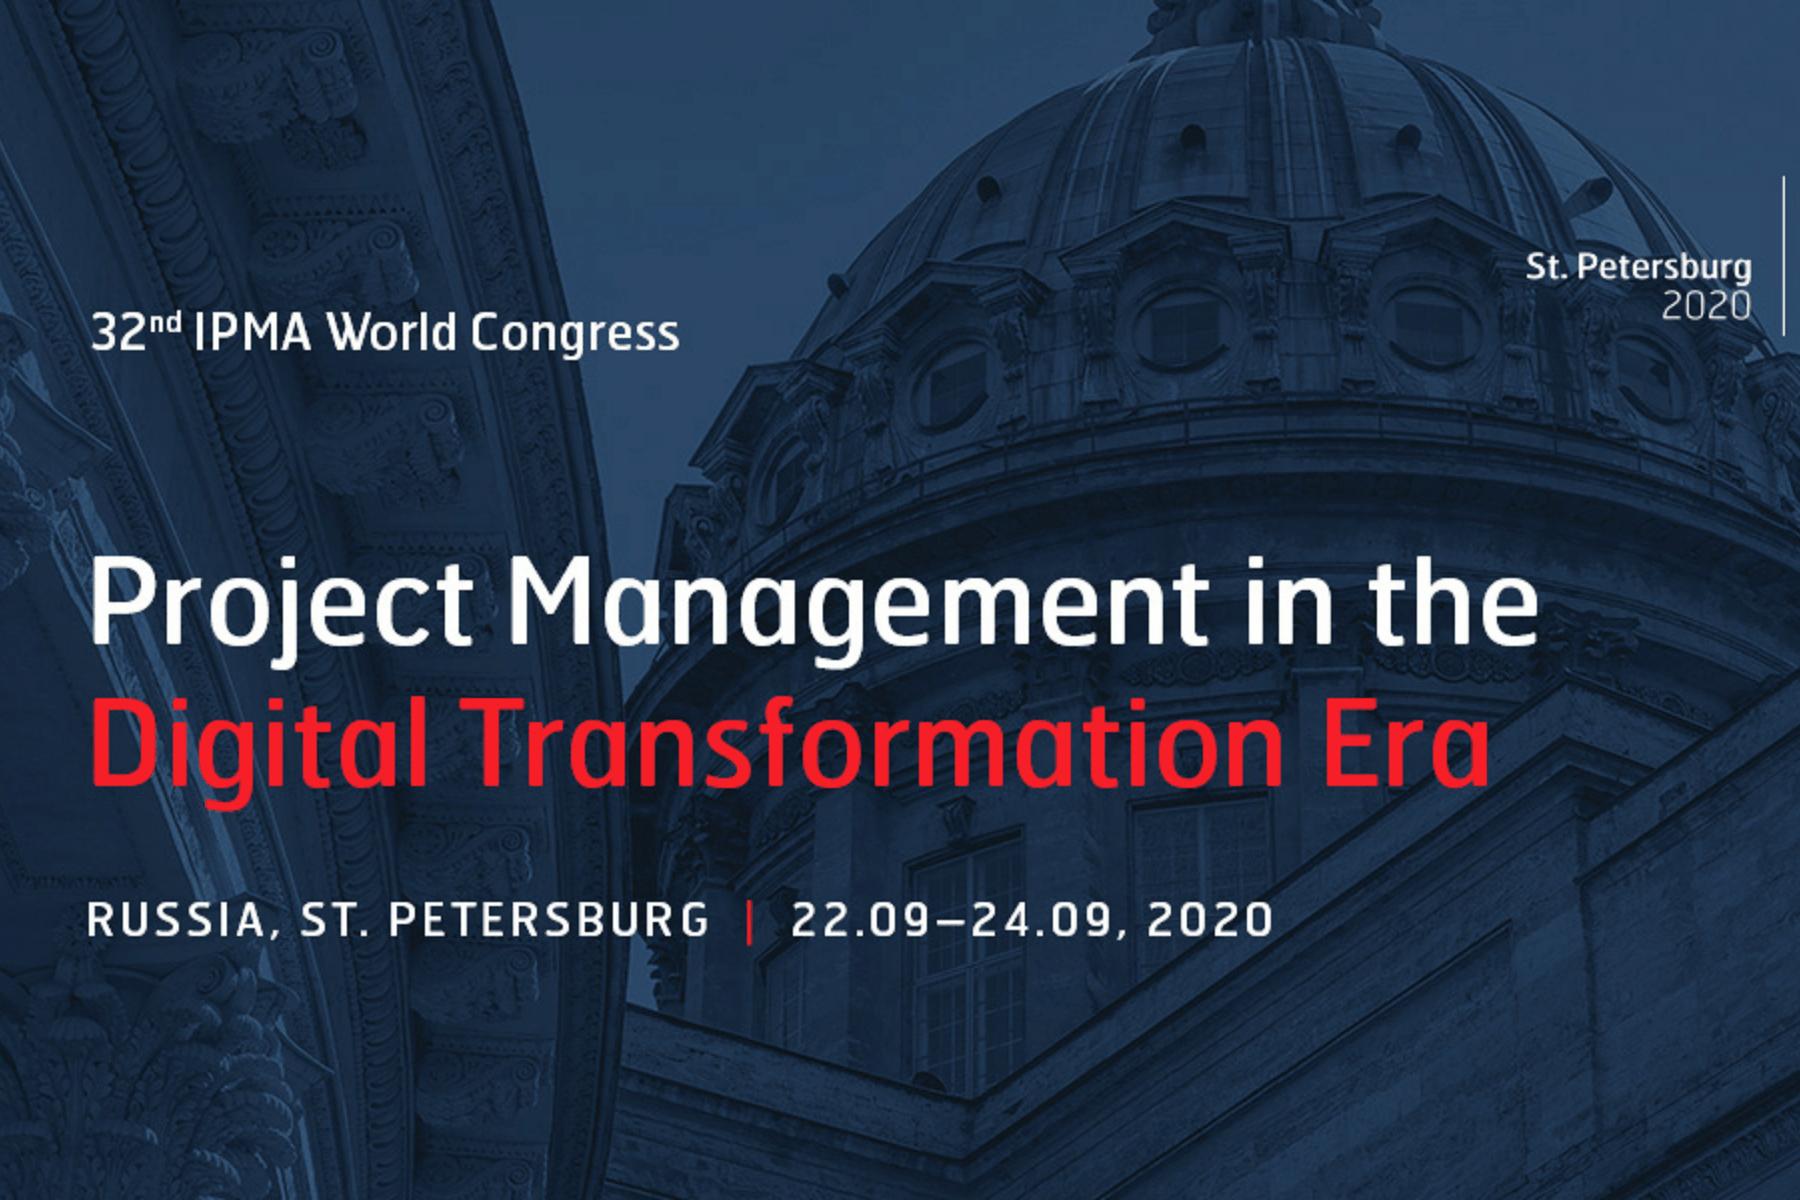 32nd IPMA World Congress: Project Management in the Digital Transformation Era